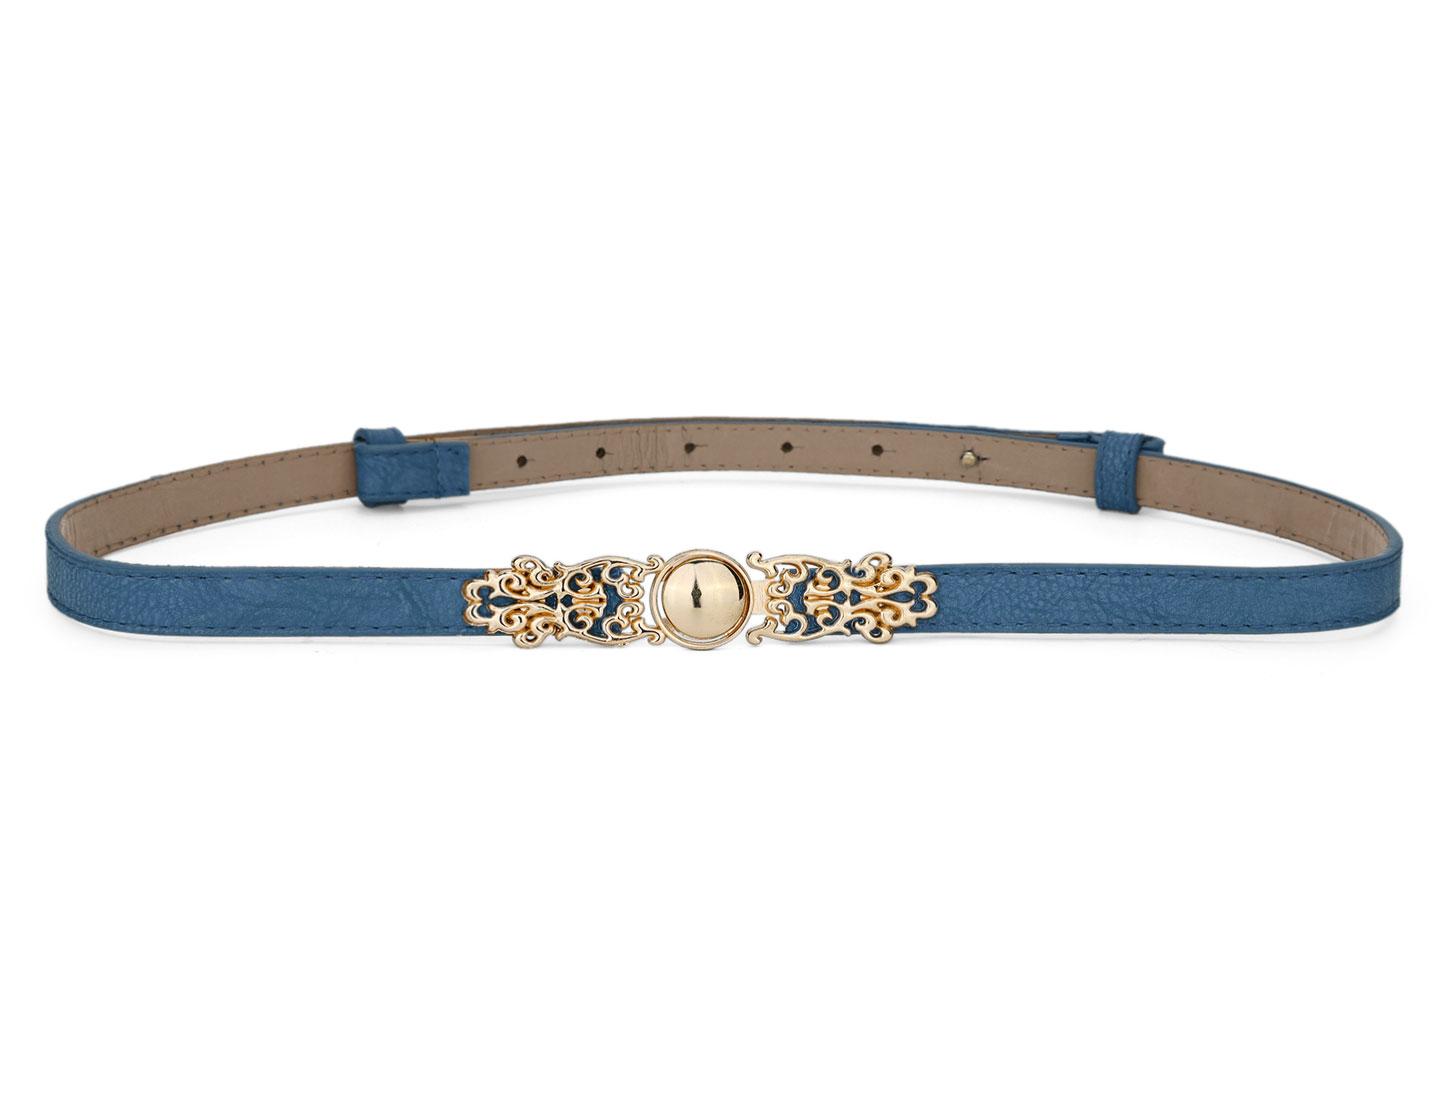 Skirt Dress Match Faux Leather Interlock Buckle Thin Waist Belt Blue for Lady